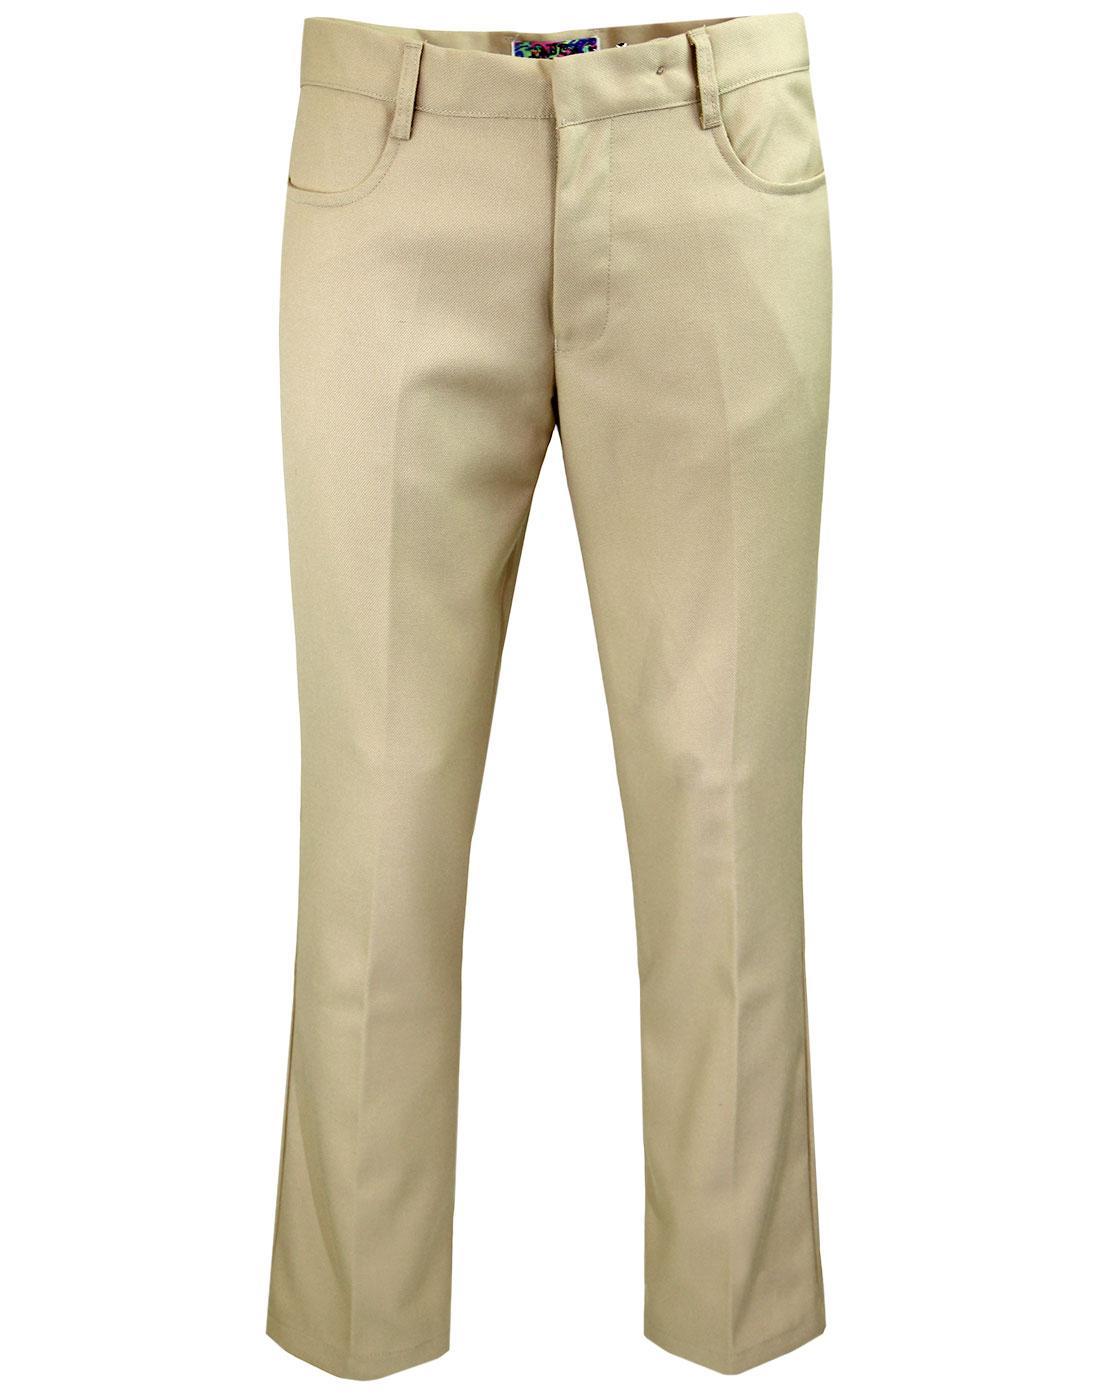 madcap england logan hopsack bootcut trousers sand